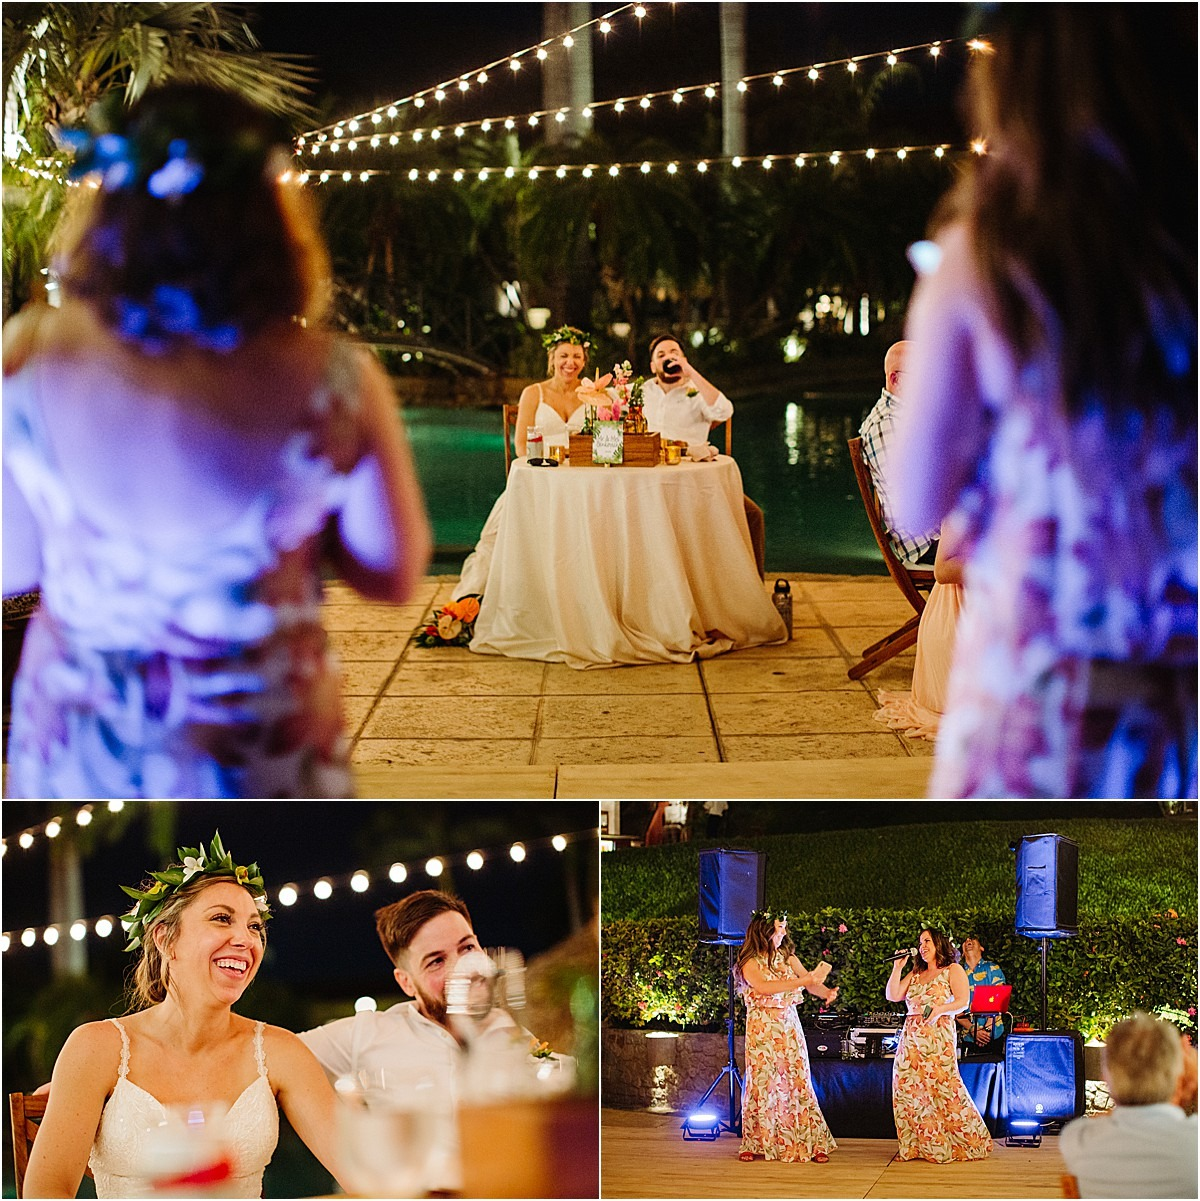 speeches at the destination wedding recepetion